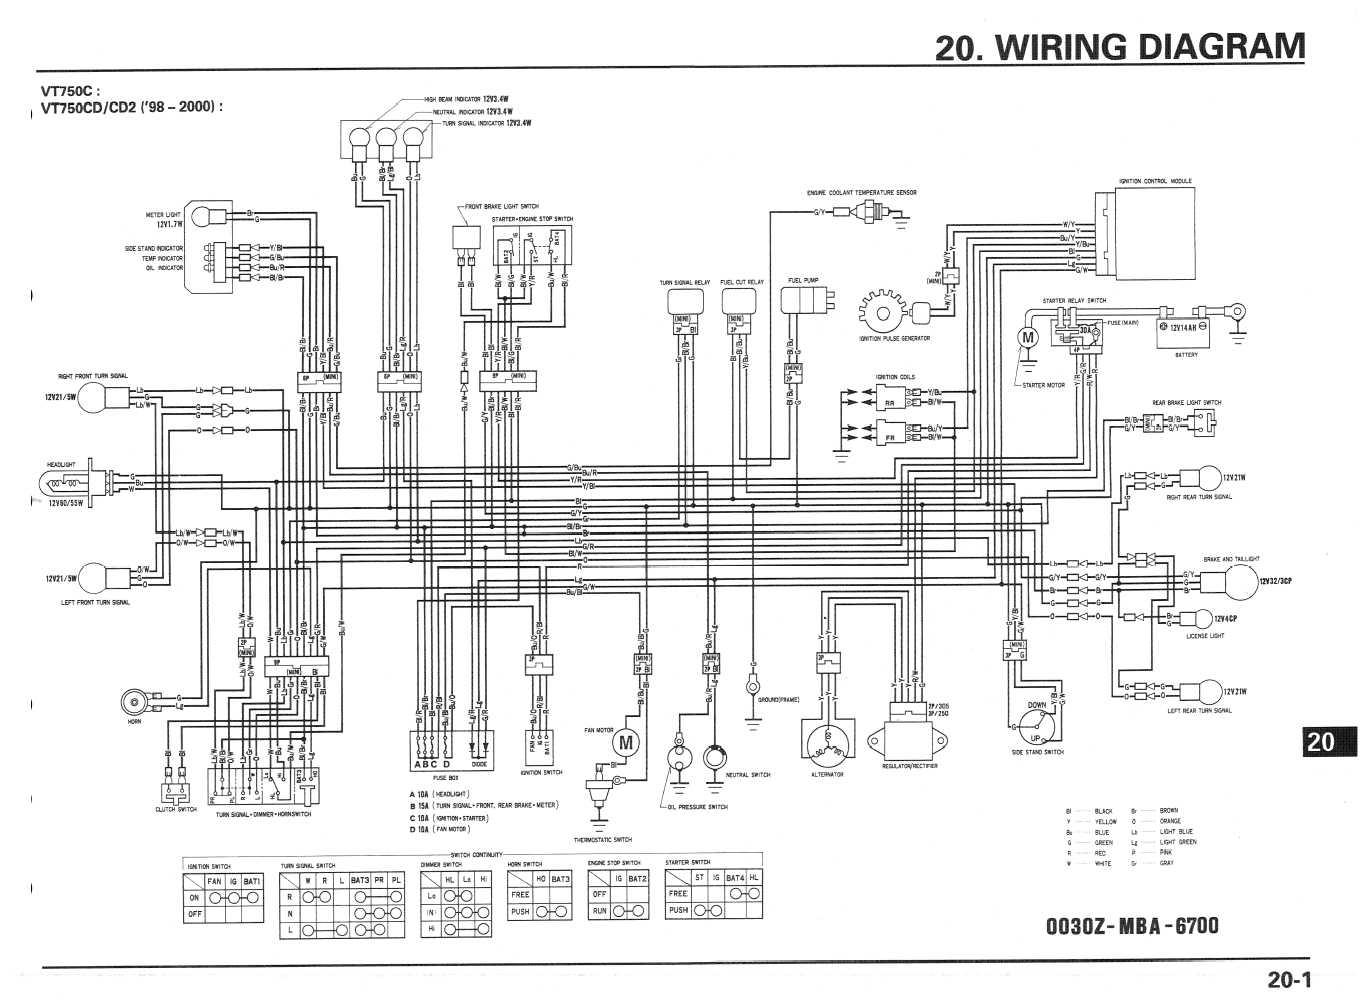 [SCHEMATICS_43NM]  DO_4235] 1994 Honda Shadow 1100 Wiring Diagram Download Diagram   Vt 750 Wiring Diagram      Oliti Phon Rine Sheox Xortanet Trons Mohammedshrine Librar Wiring 101